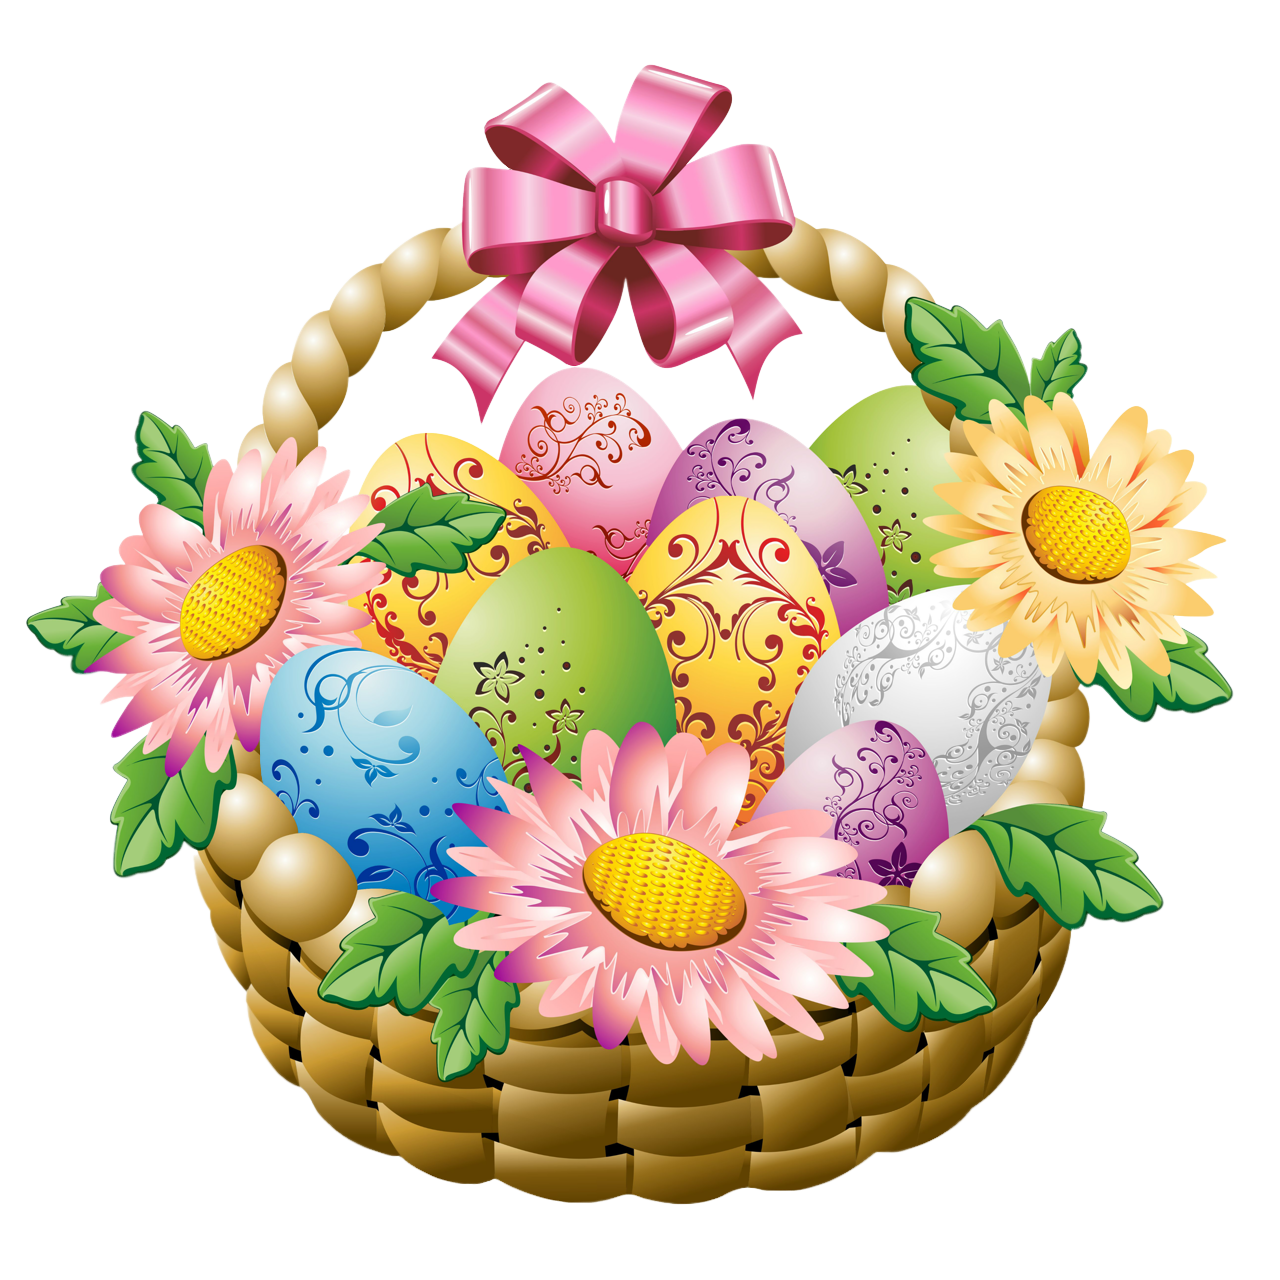 1280x1280 42 Imagens De Cesta De Easter Baskets, Easter And Easter